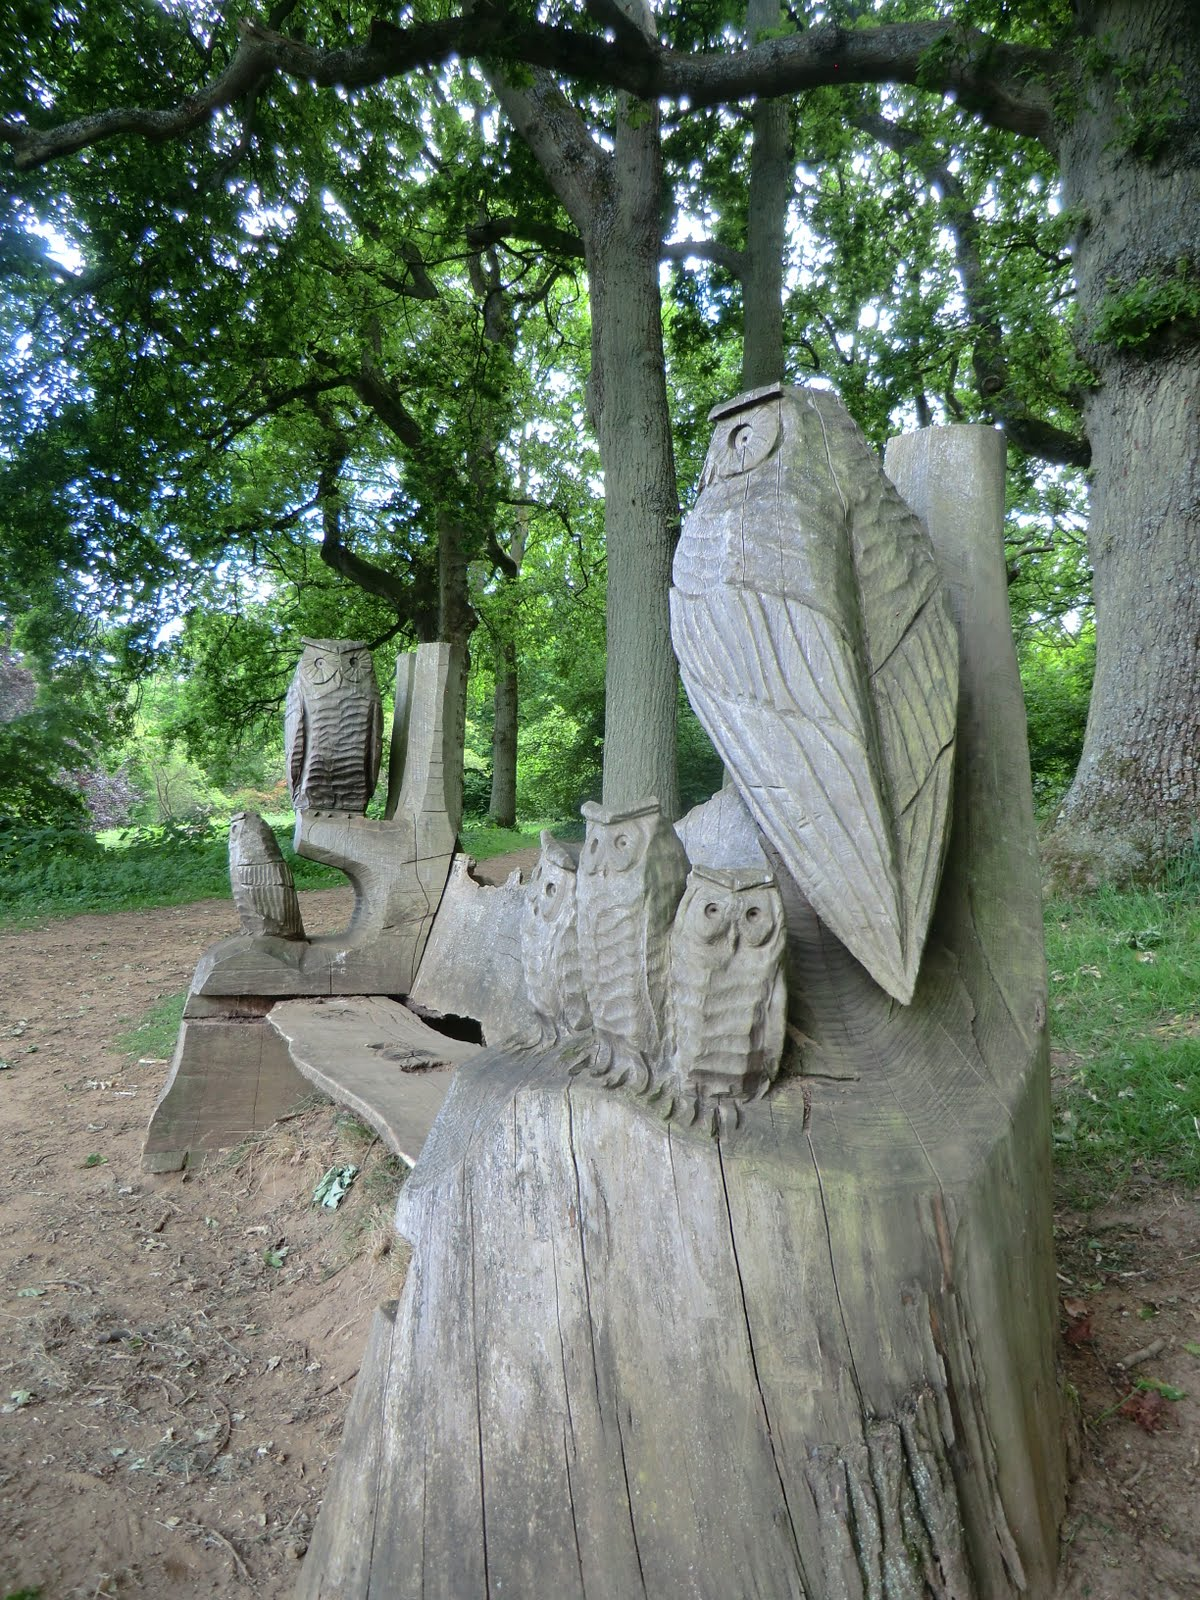 CIMG8412 Owl sculpture, Winkworth Arboretum